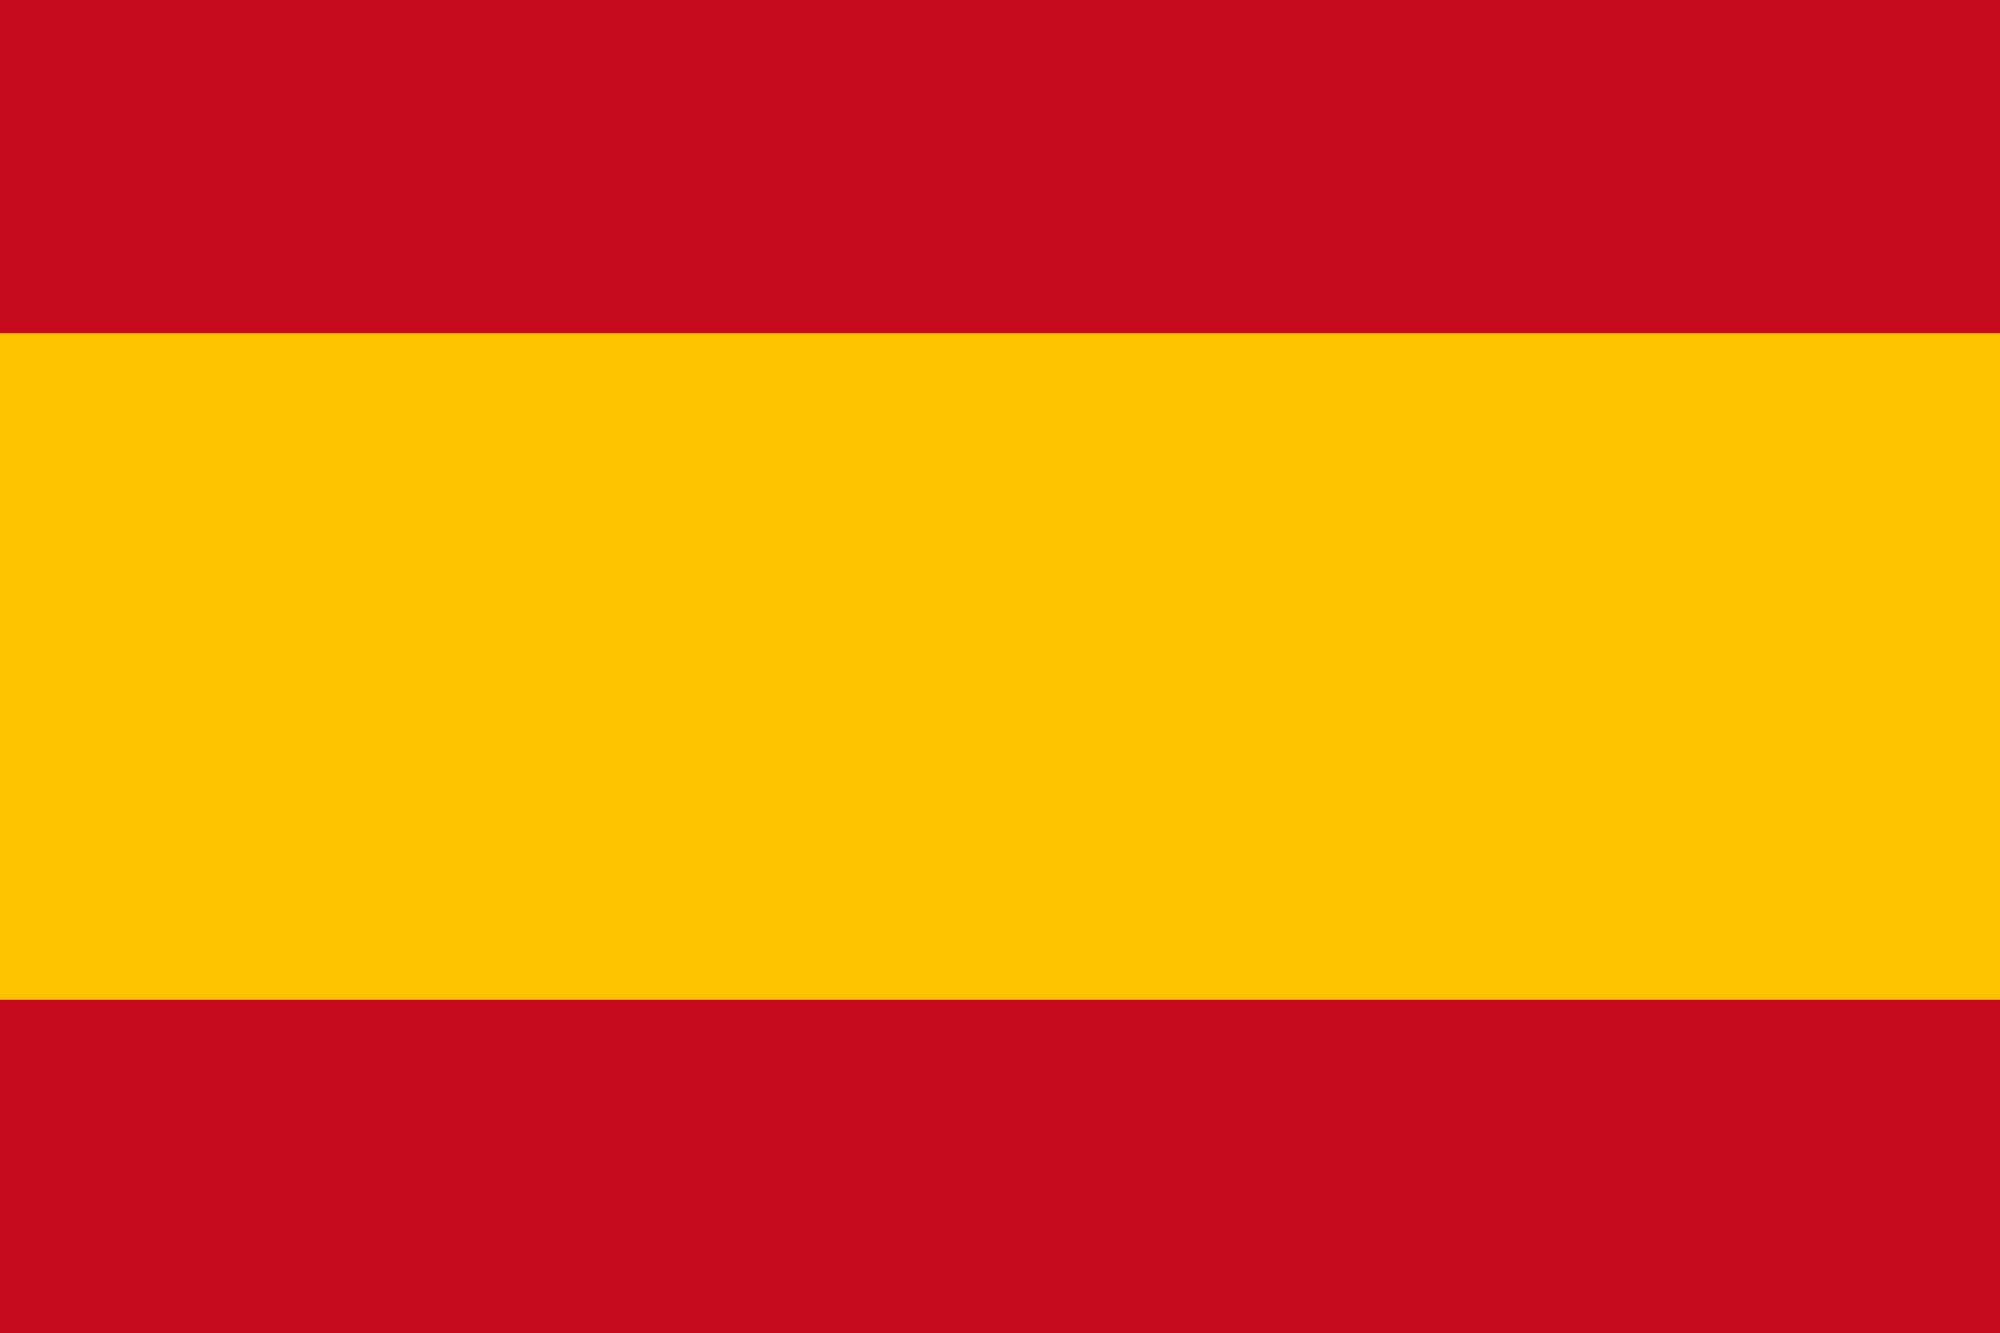 Spanje_hoogstespaarrente_EU_land